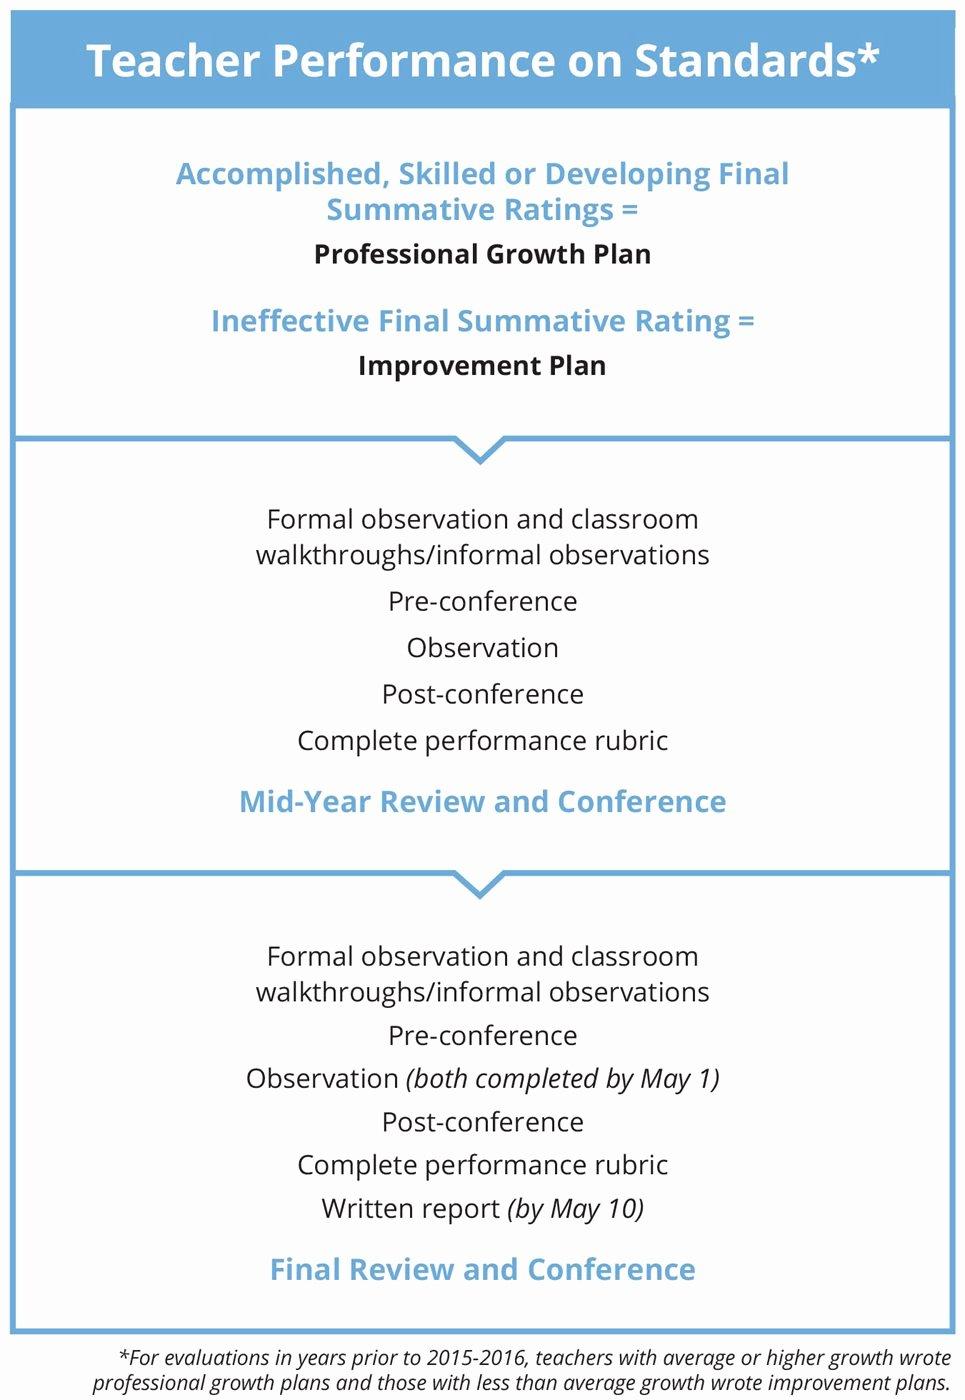 Professional Growth Plan Templates Elegant Teacher Performance